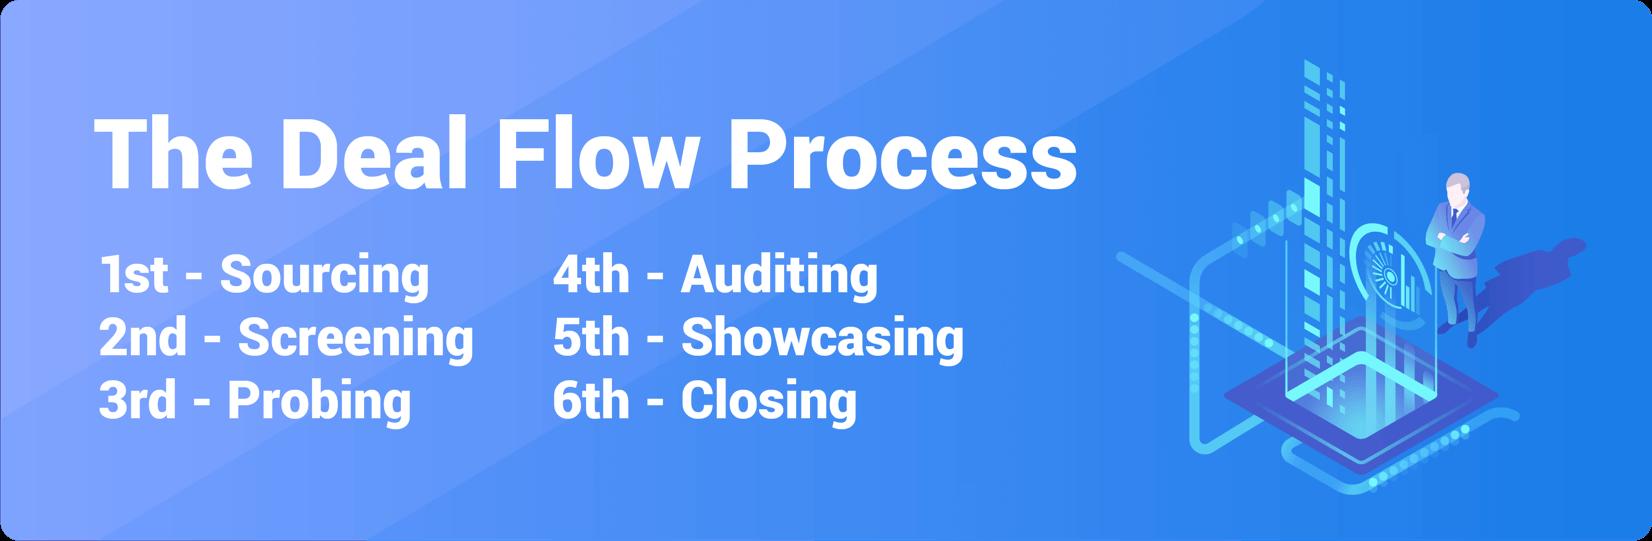 deal flow process